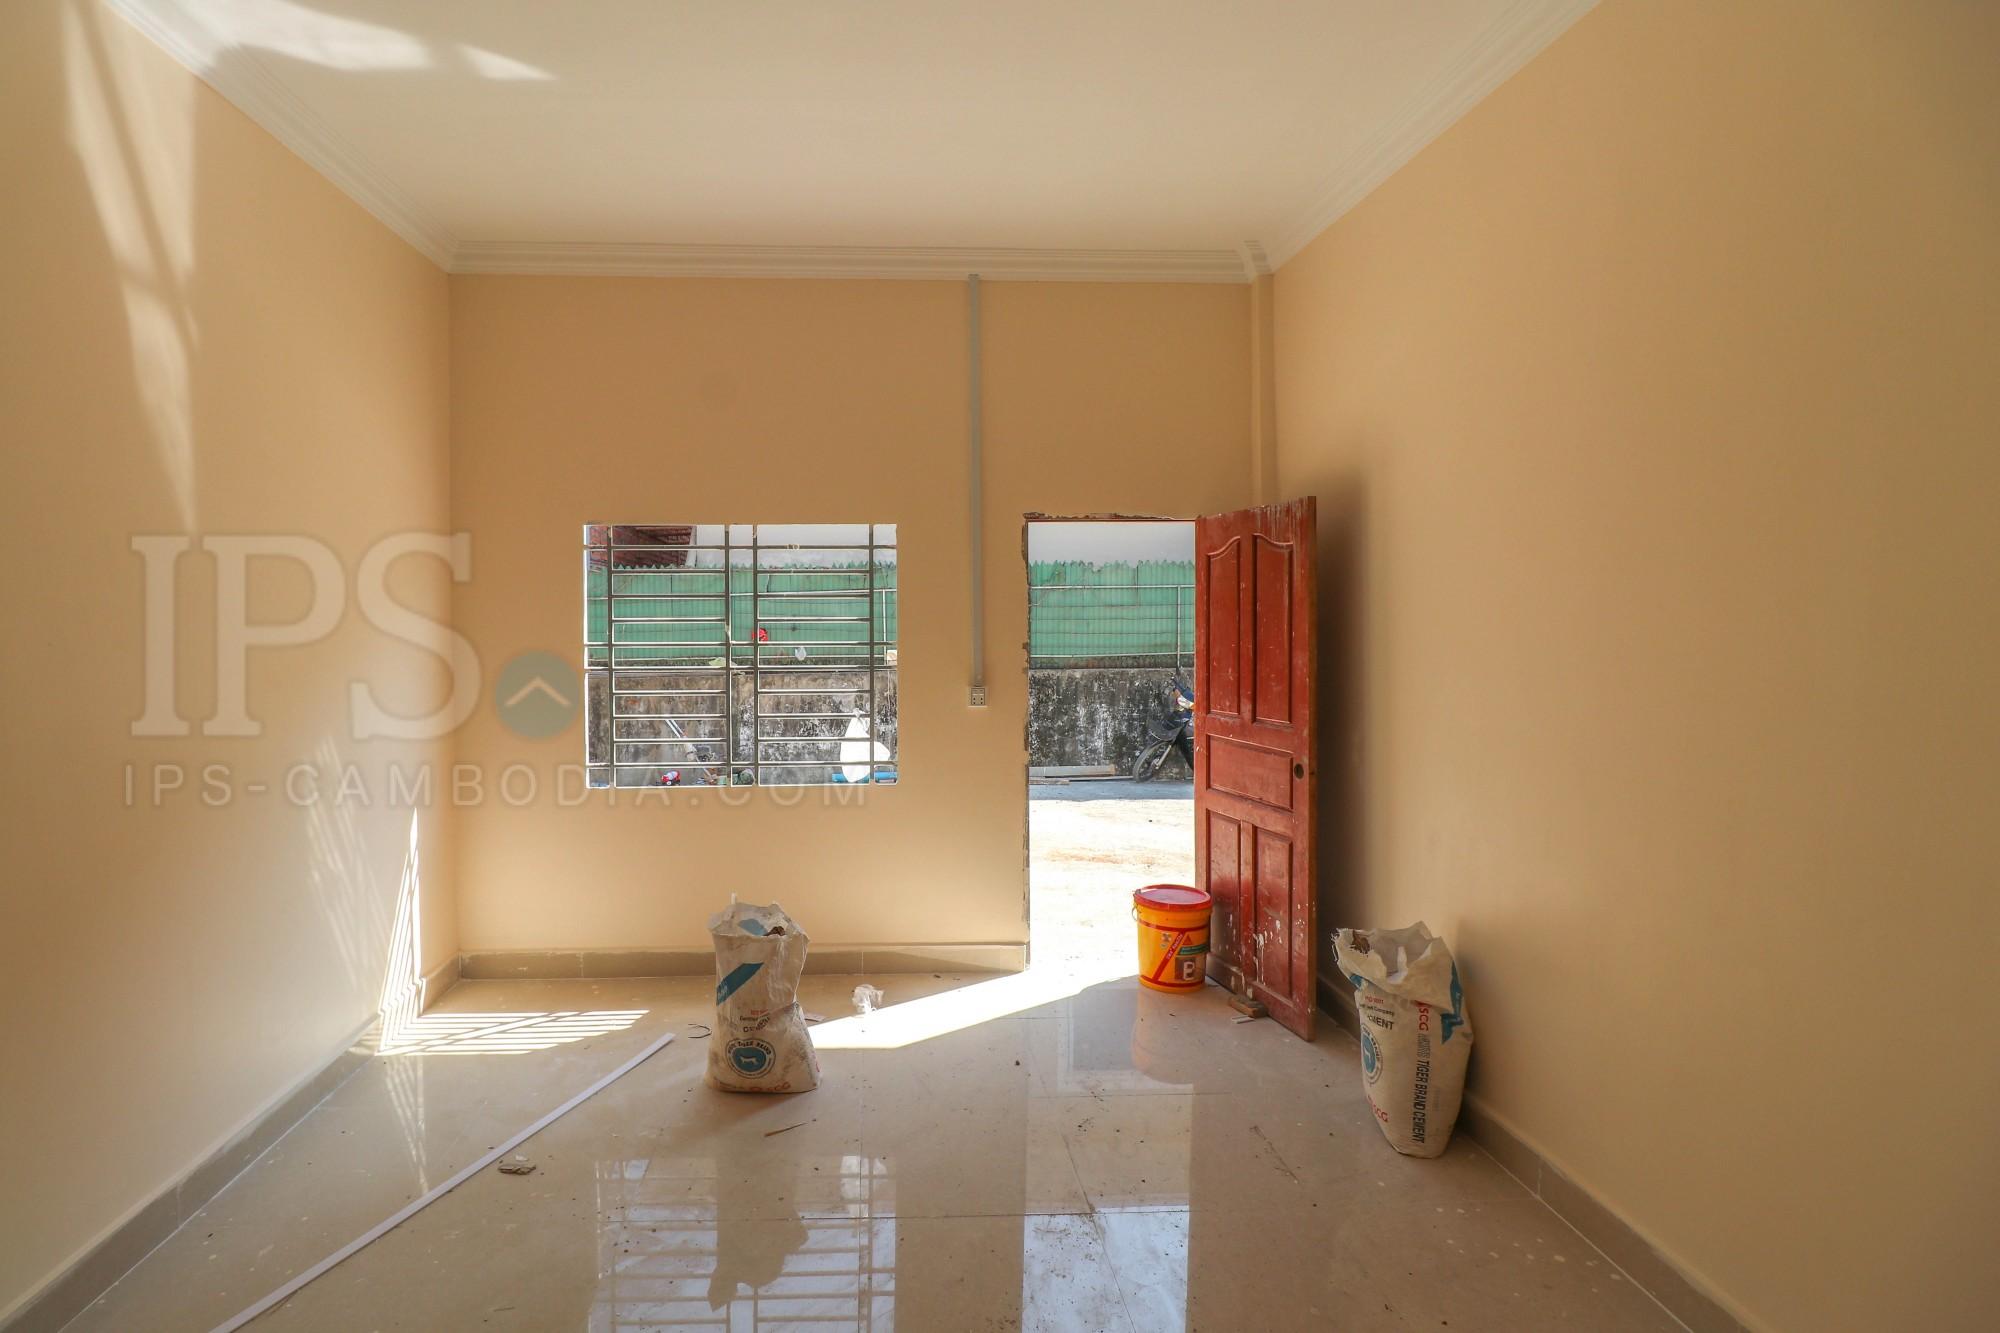 9 Apartment Units For Rent - Mittapheap, Sihanoukville